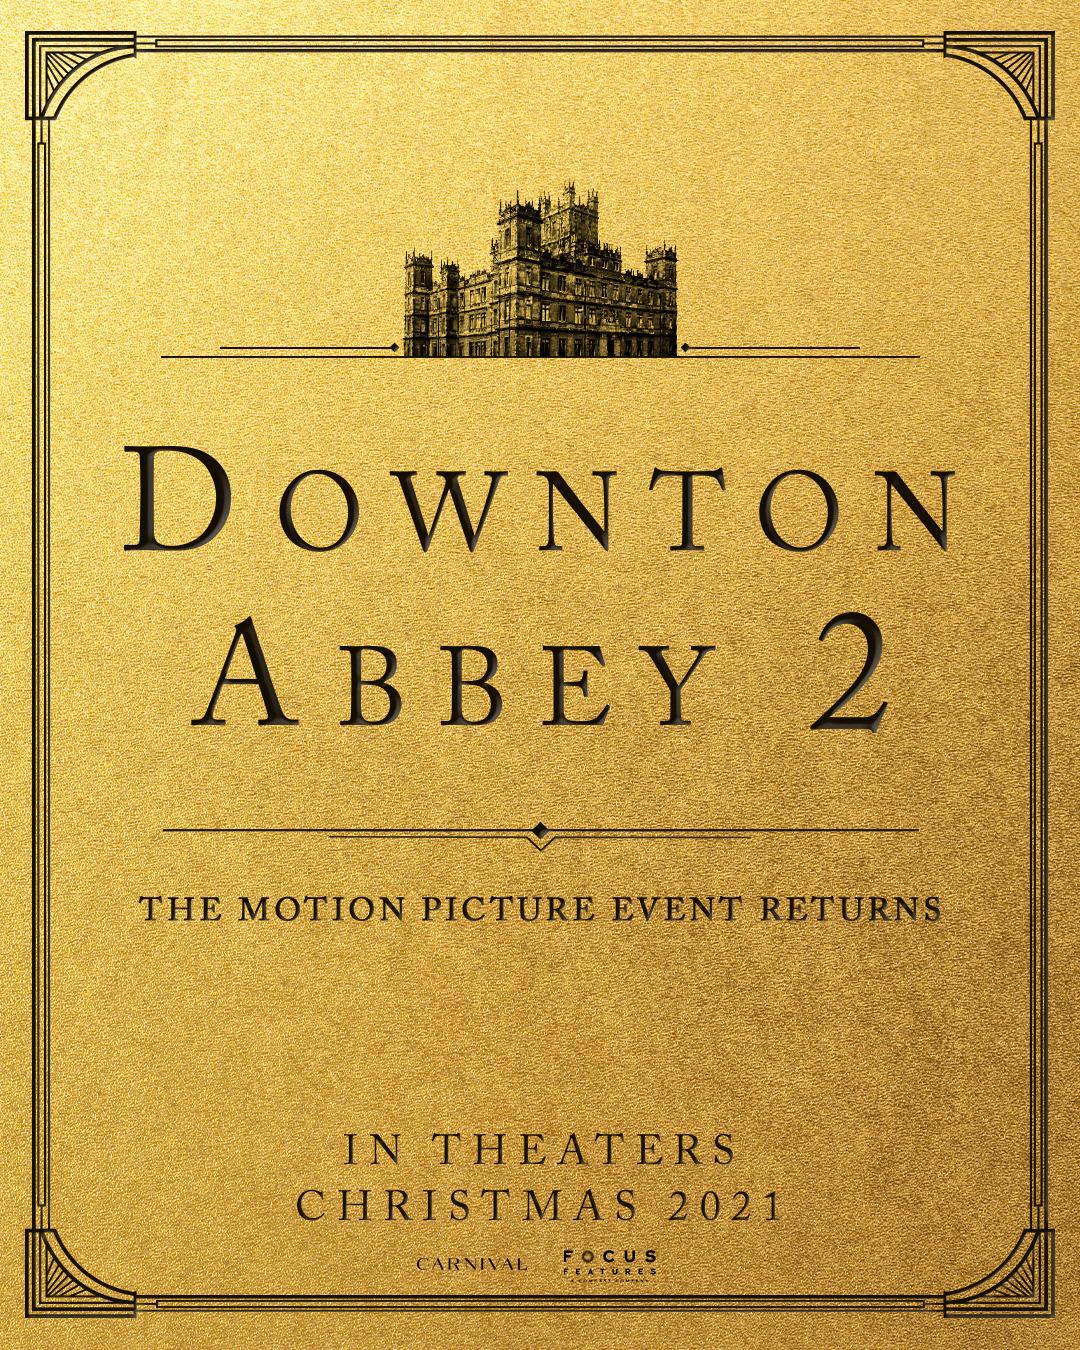 Downton Abbey 2 notice